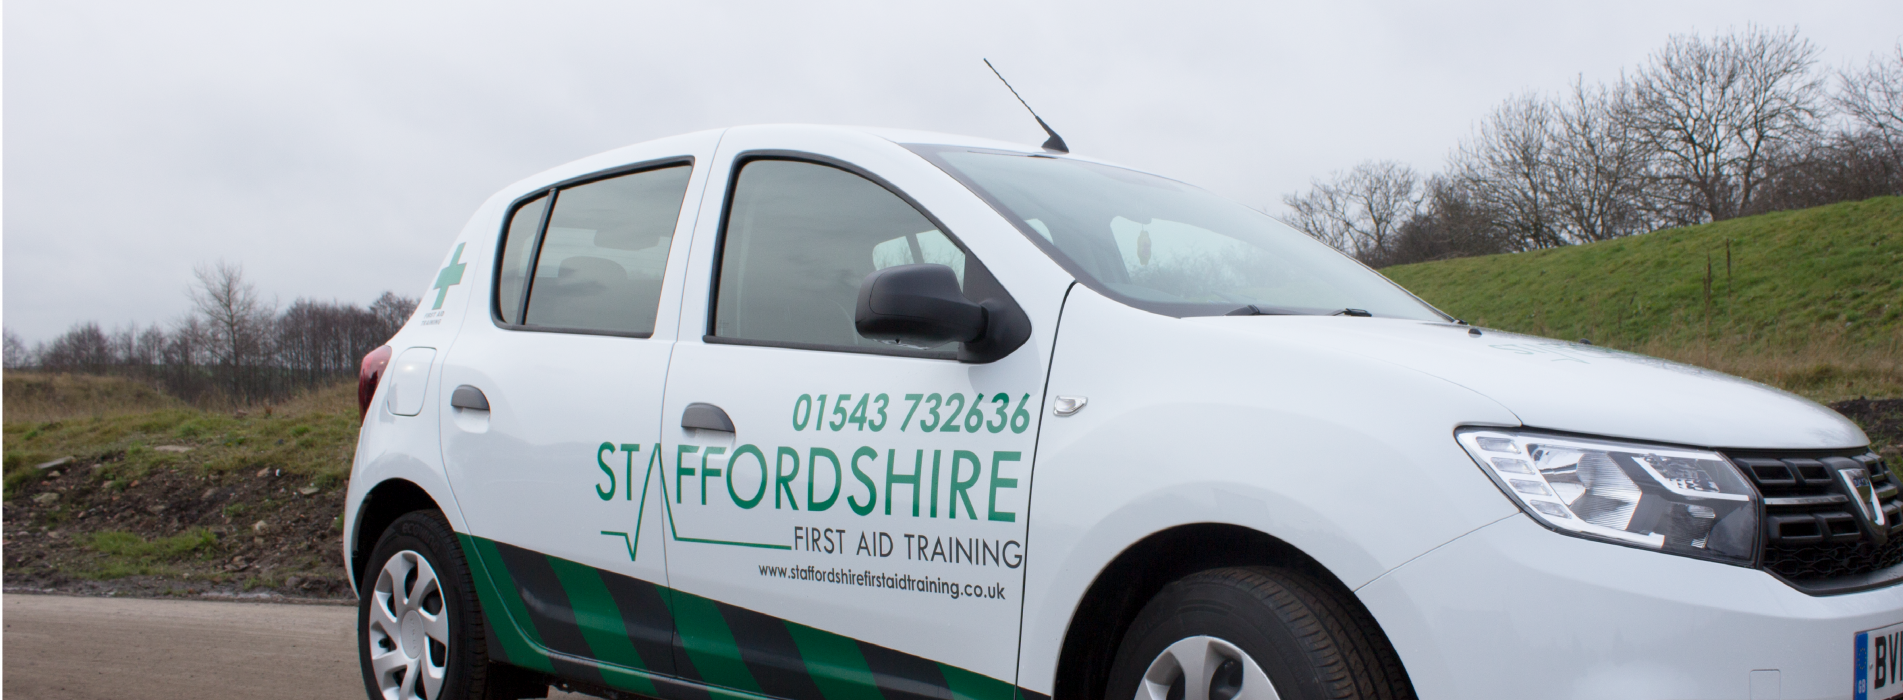 Bradford first aid training